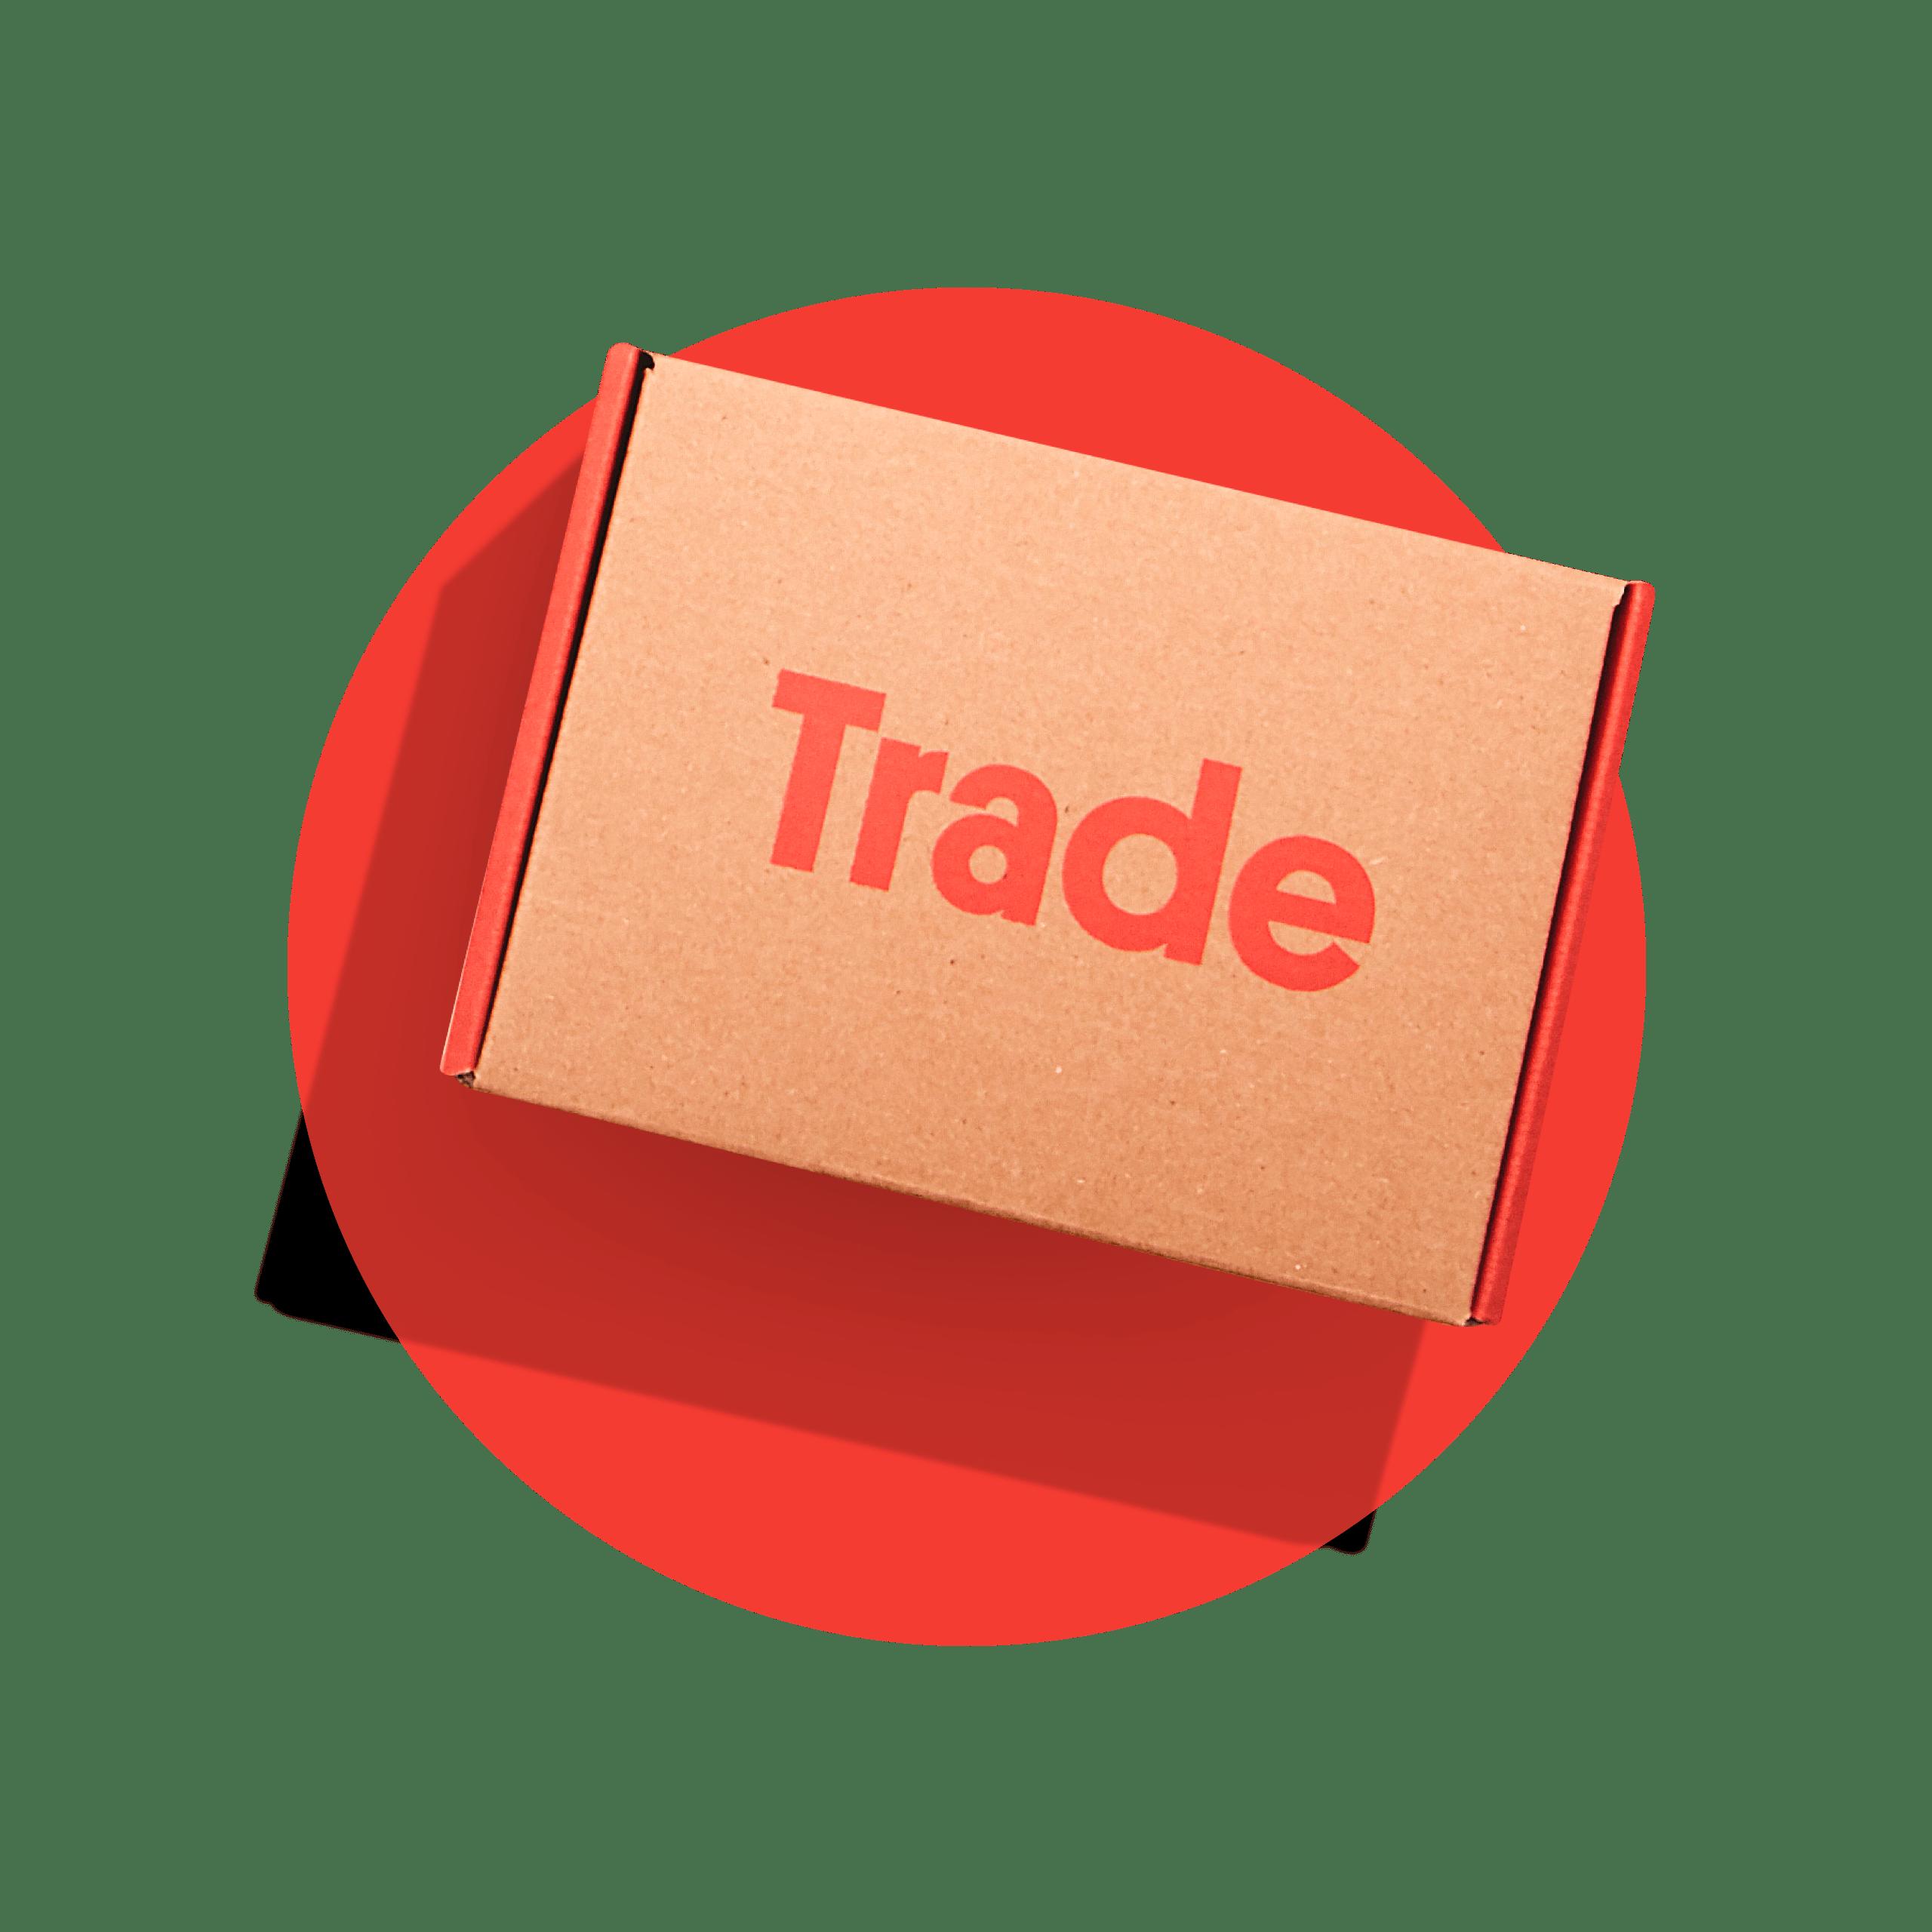 Trade Box